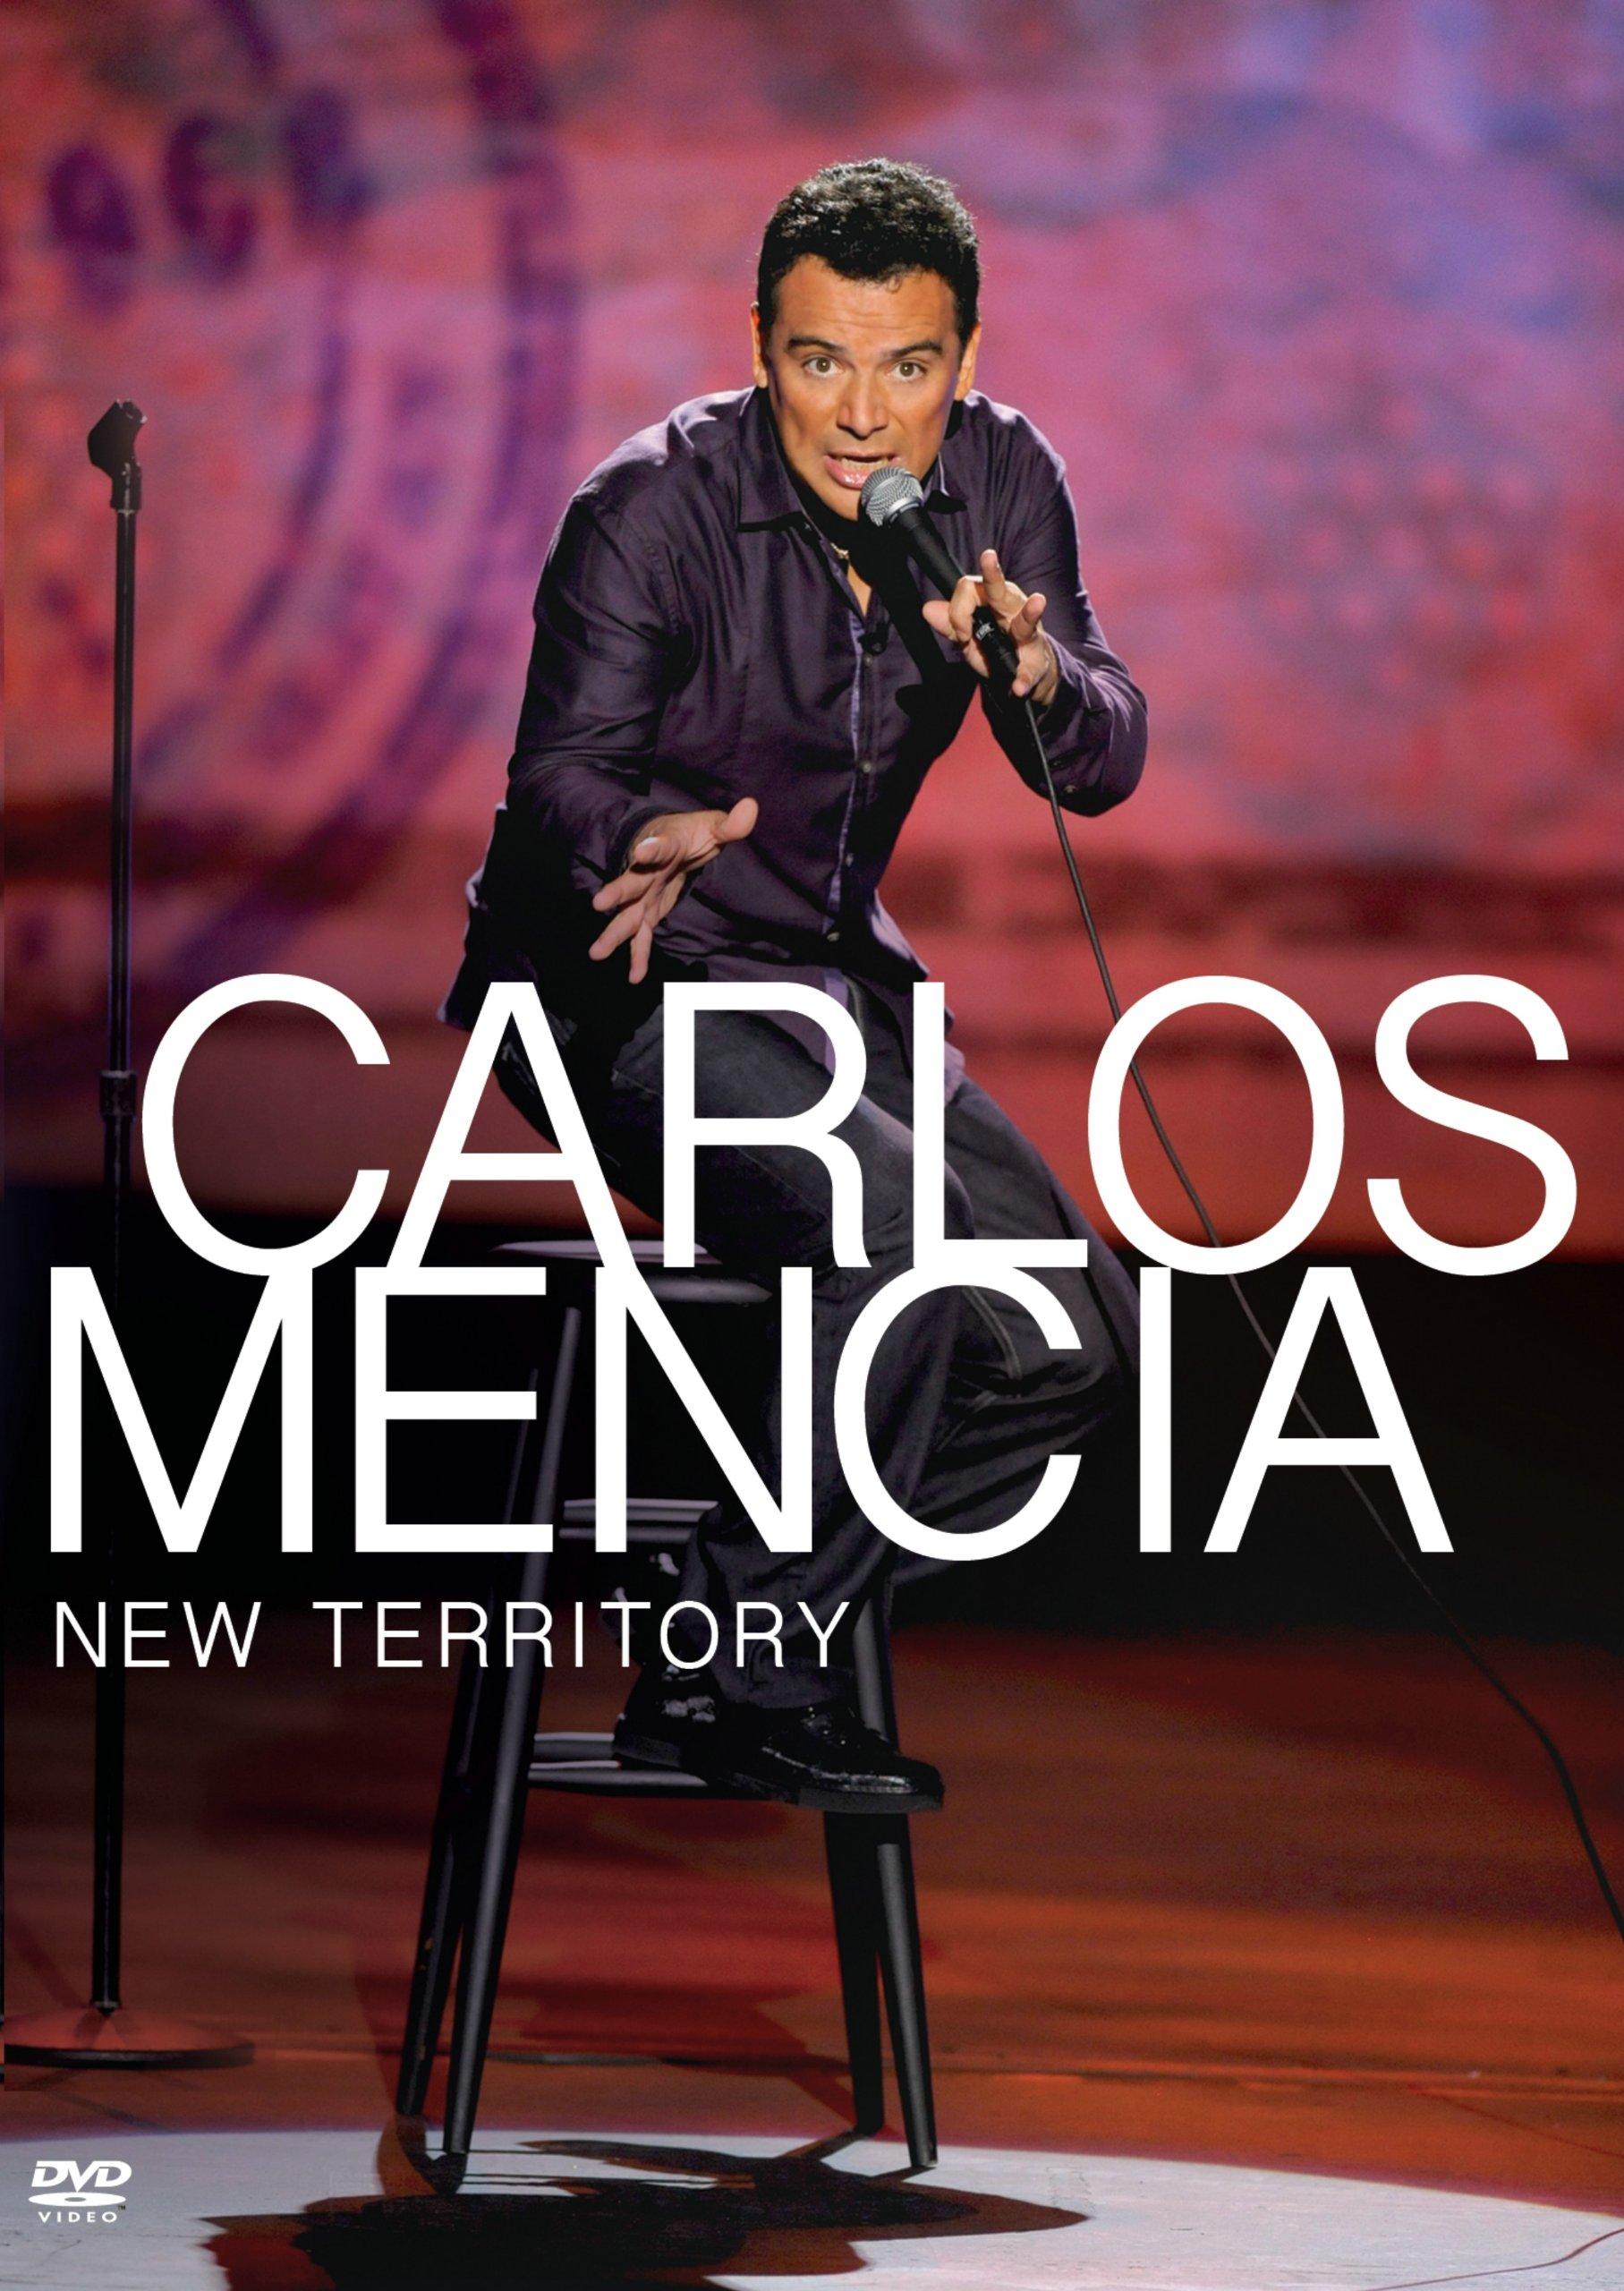 DVD : Carlos Mencia - Carlos Mencia: New Territory (Widescreen, AC-3)